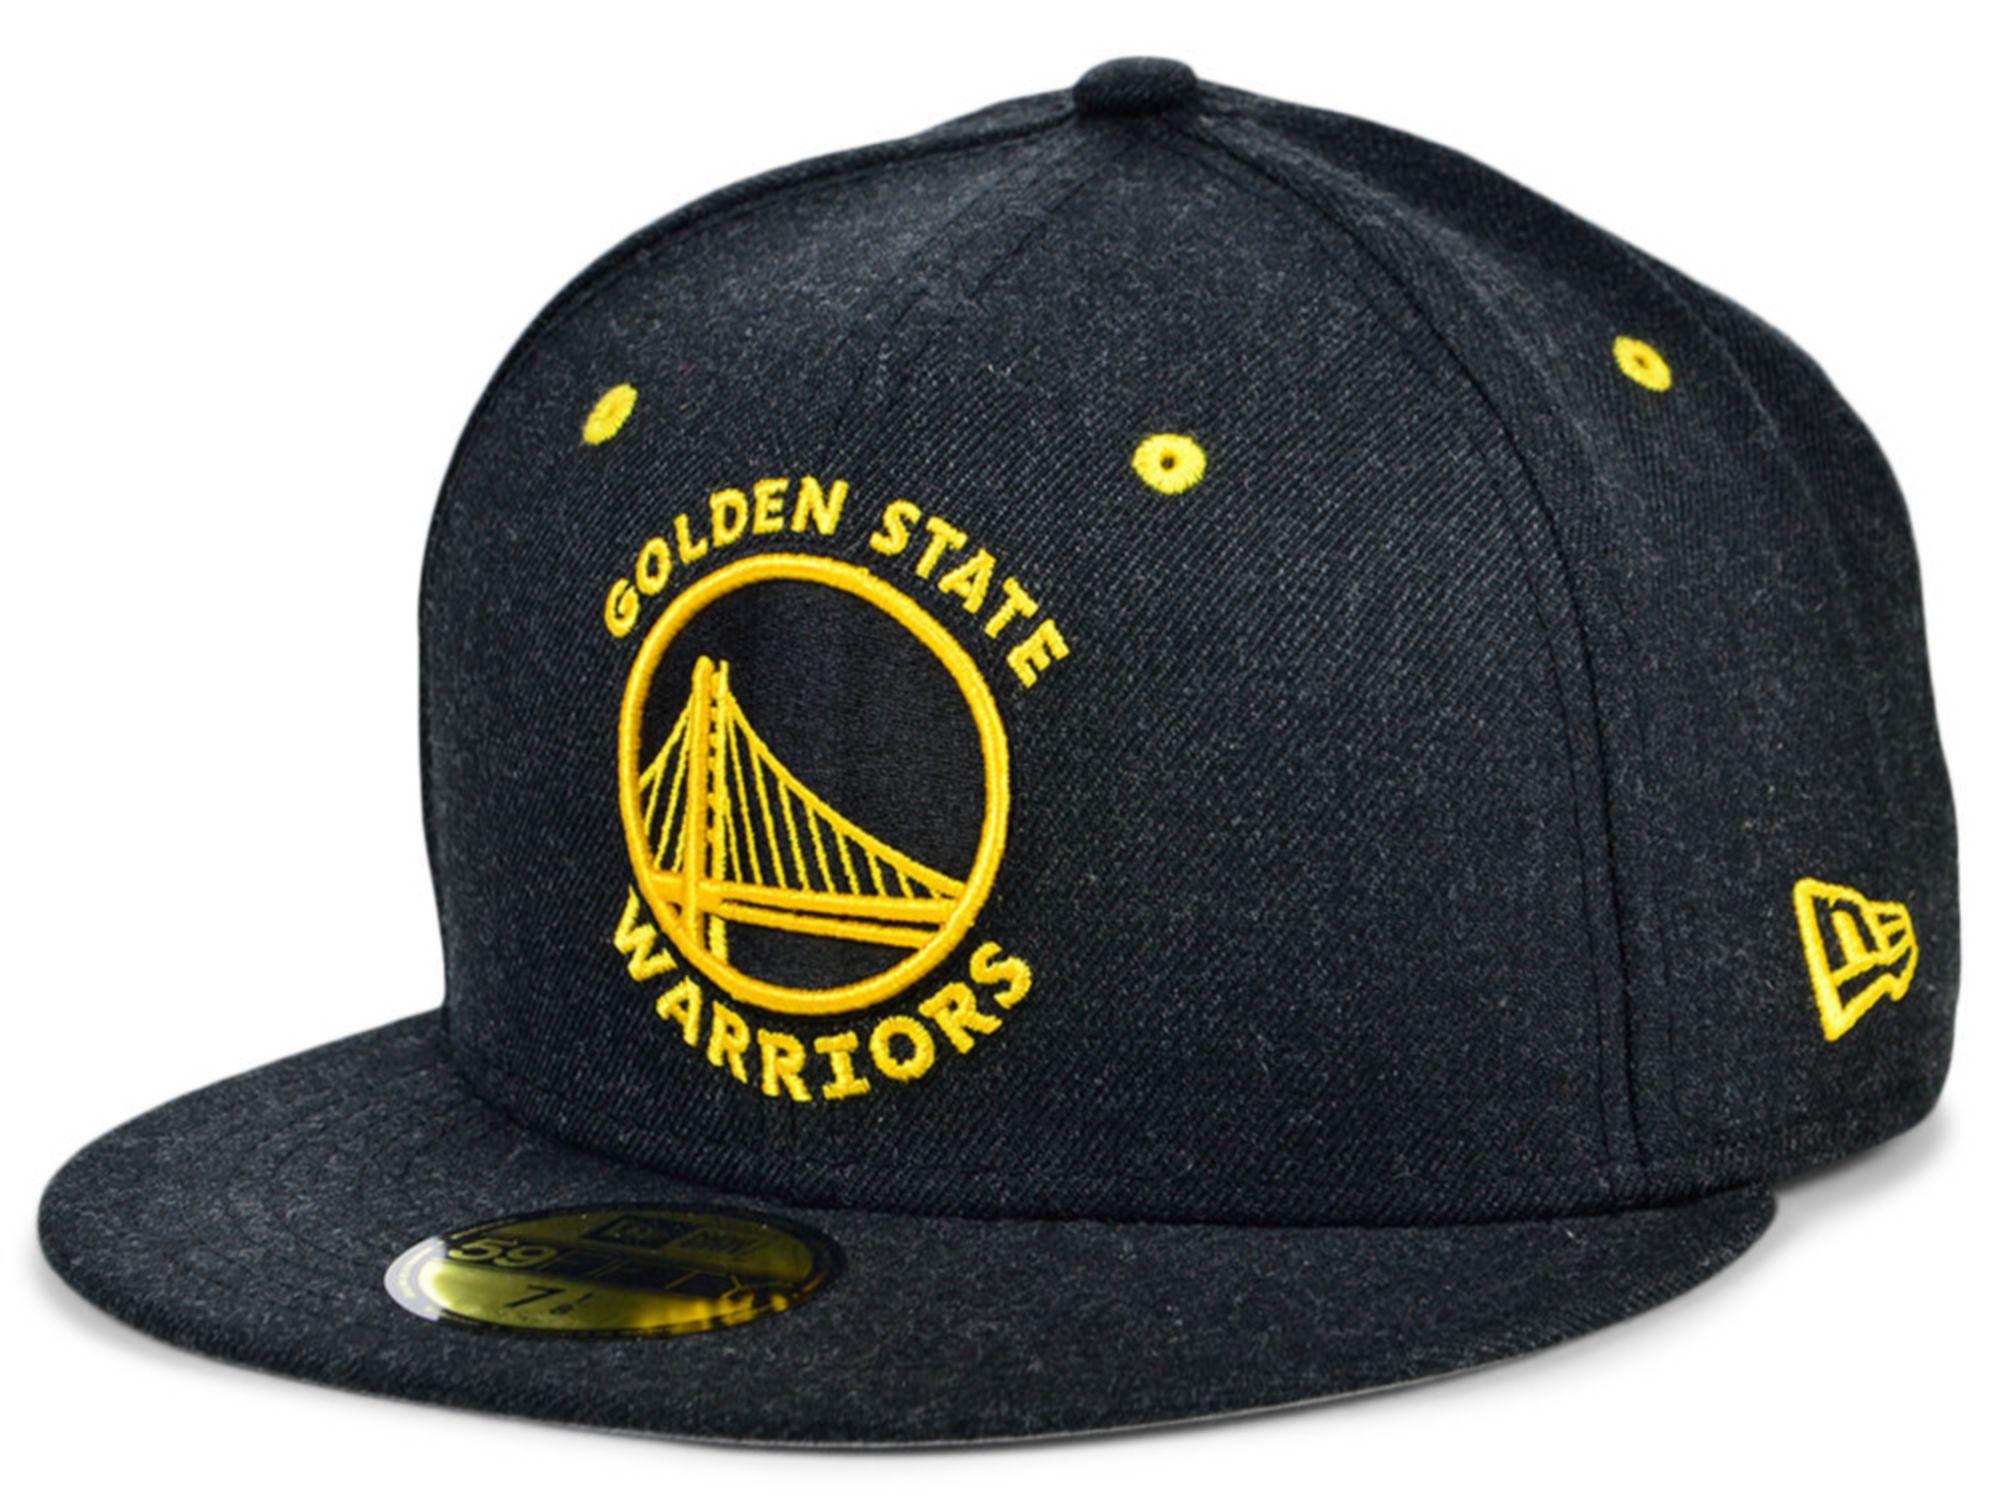 New Era Golden State Warriors Custom 59FIFTY Cap & Reviews - NBA - Sports Fan Shop - Macy's